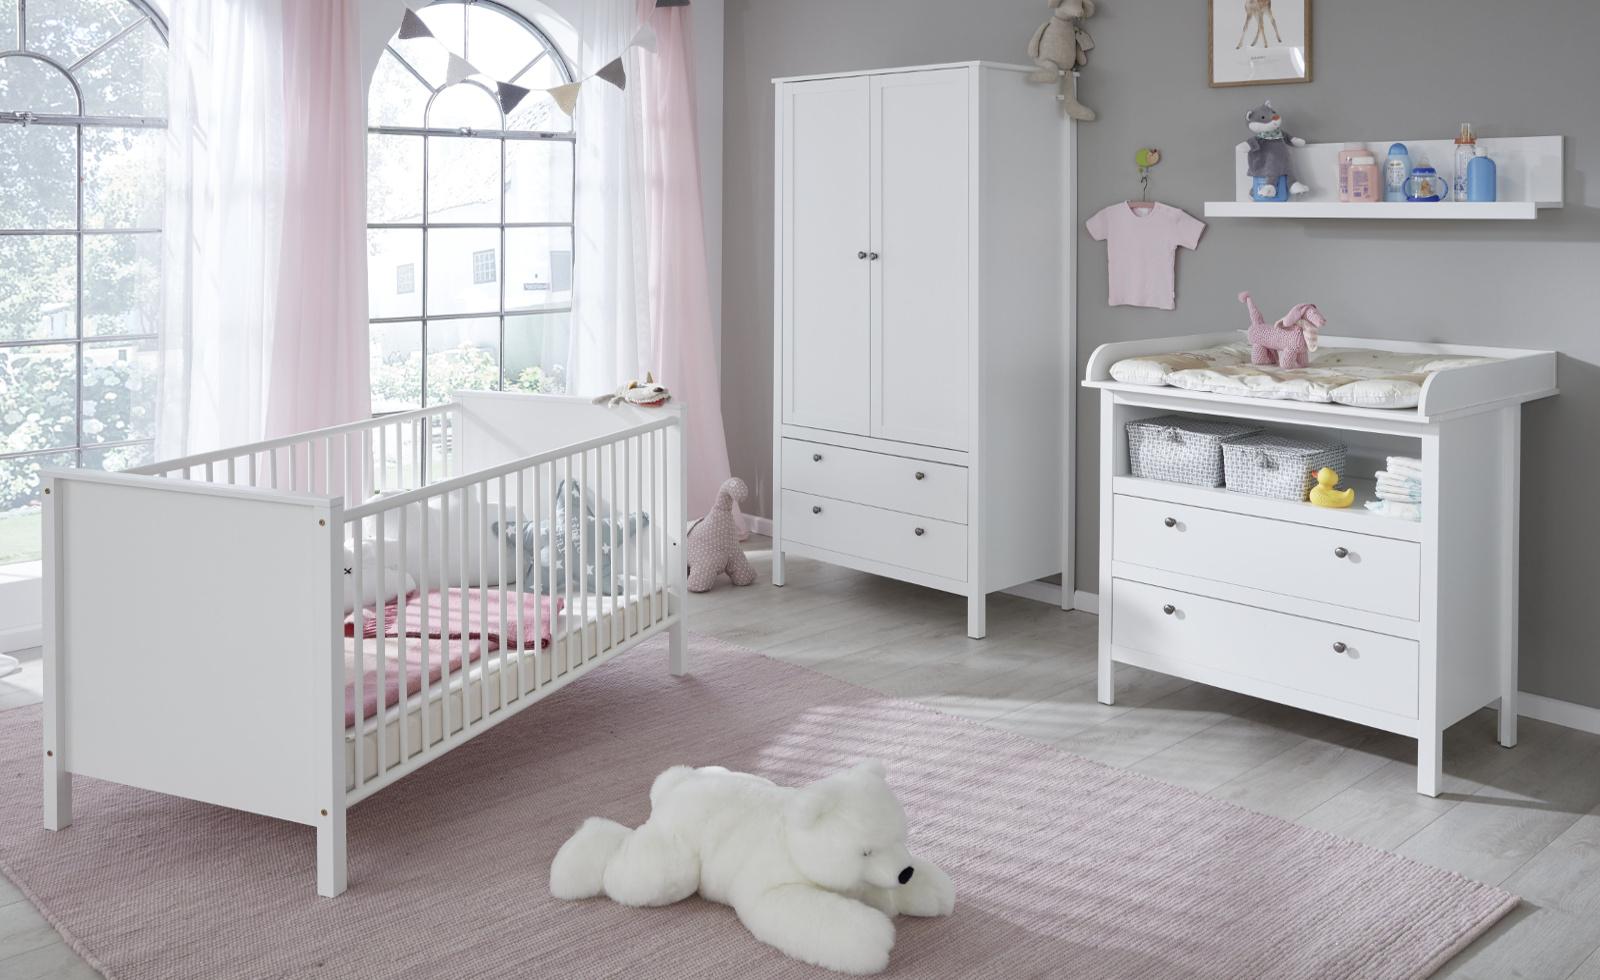 babybett ole wei 70 x 140 cm. Black Bedroom Furniture Sets. Home Design Ideas